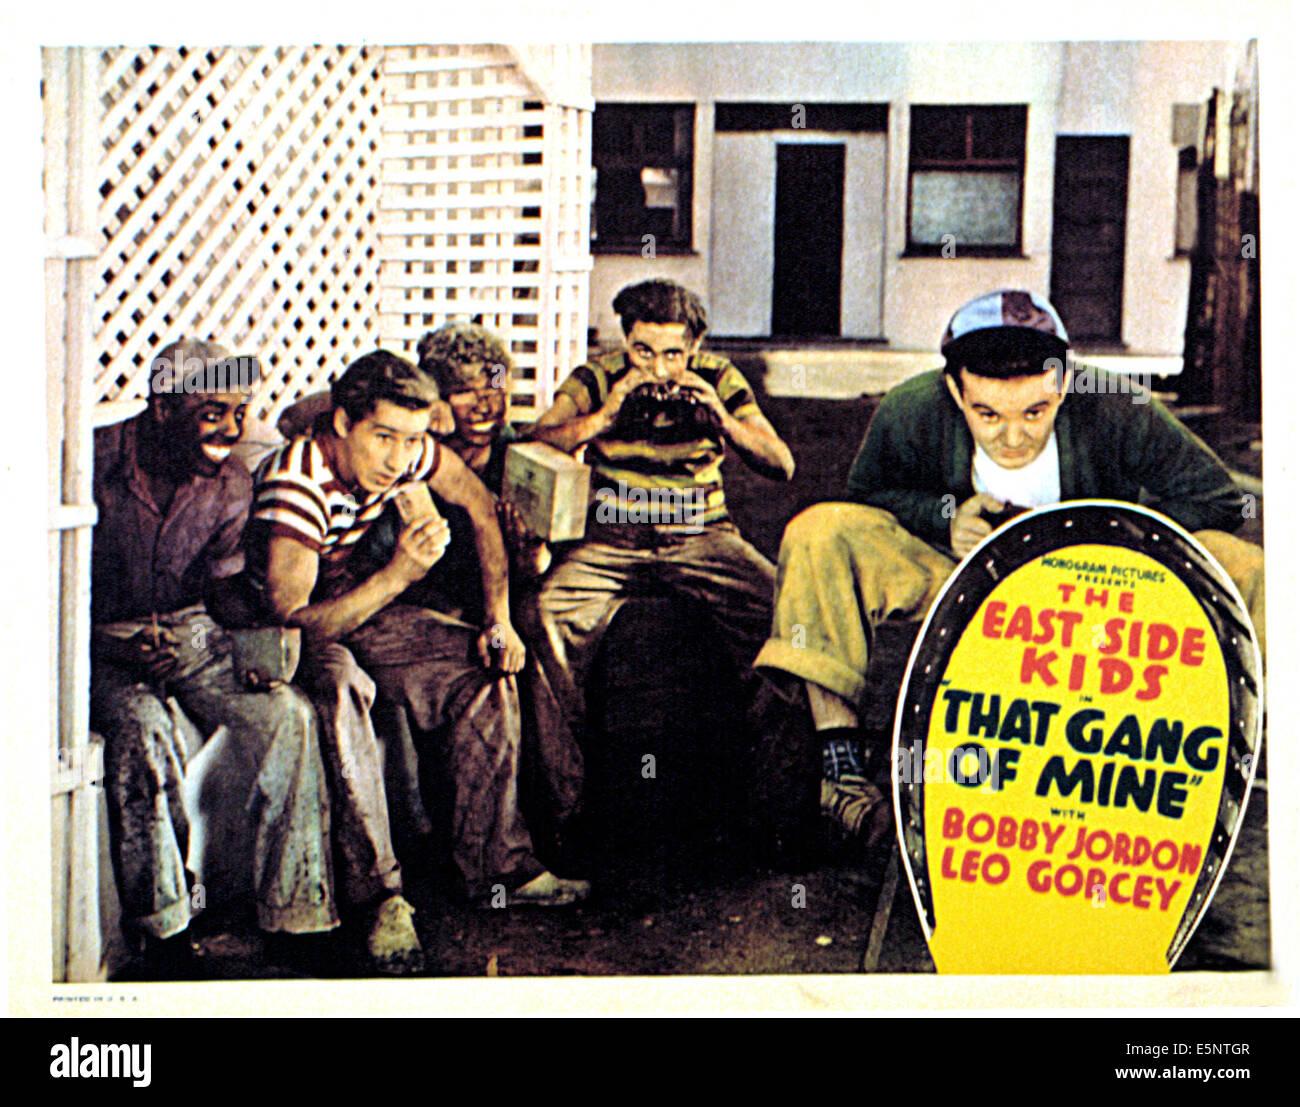 THAT GANG OF MINE, Ernest Morrison, Bobby Jordan, Eugene Francis, David Gorcey, Leo Gorcey, 1940 - Stock Image